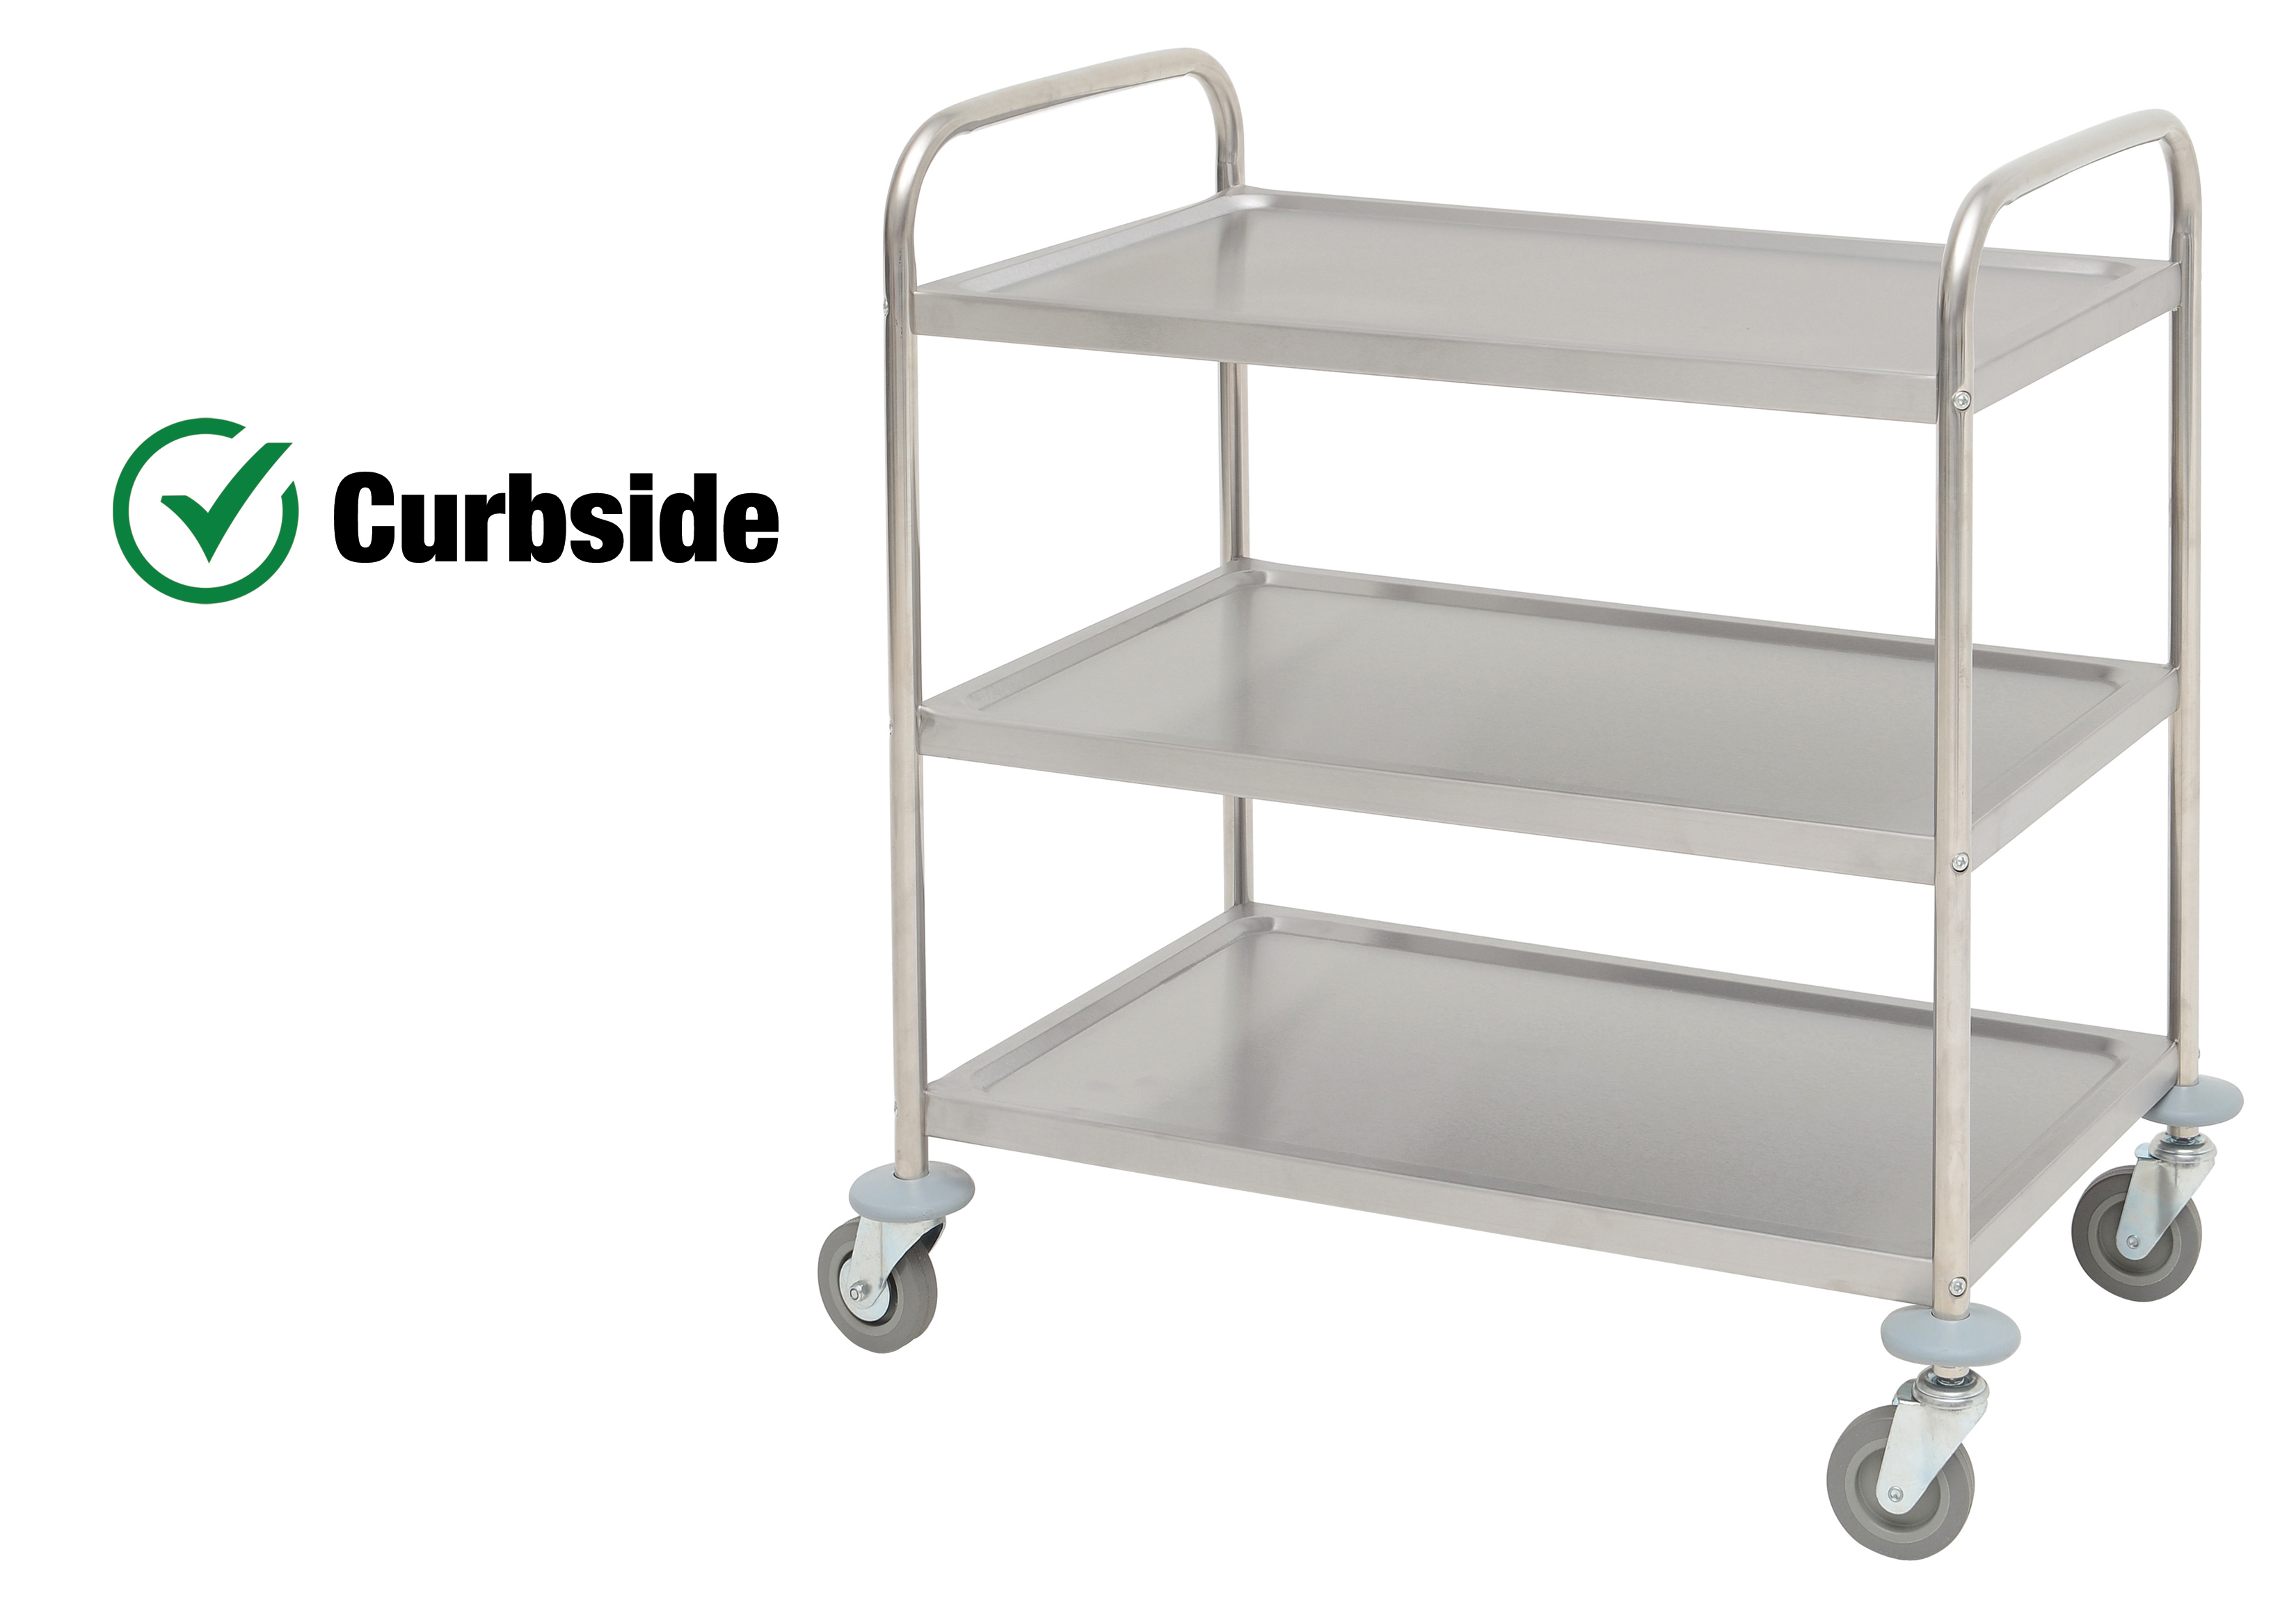 HUBERT Stainless Steel 3-Shelf Large Trolley Cart